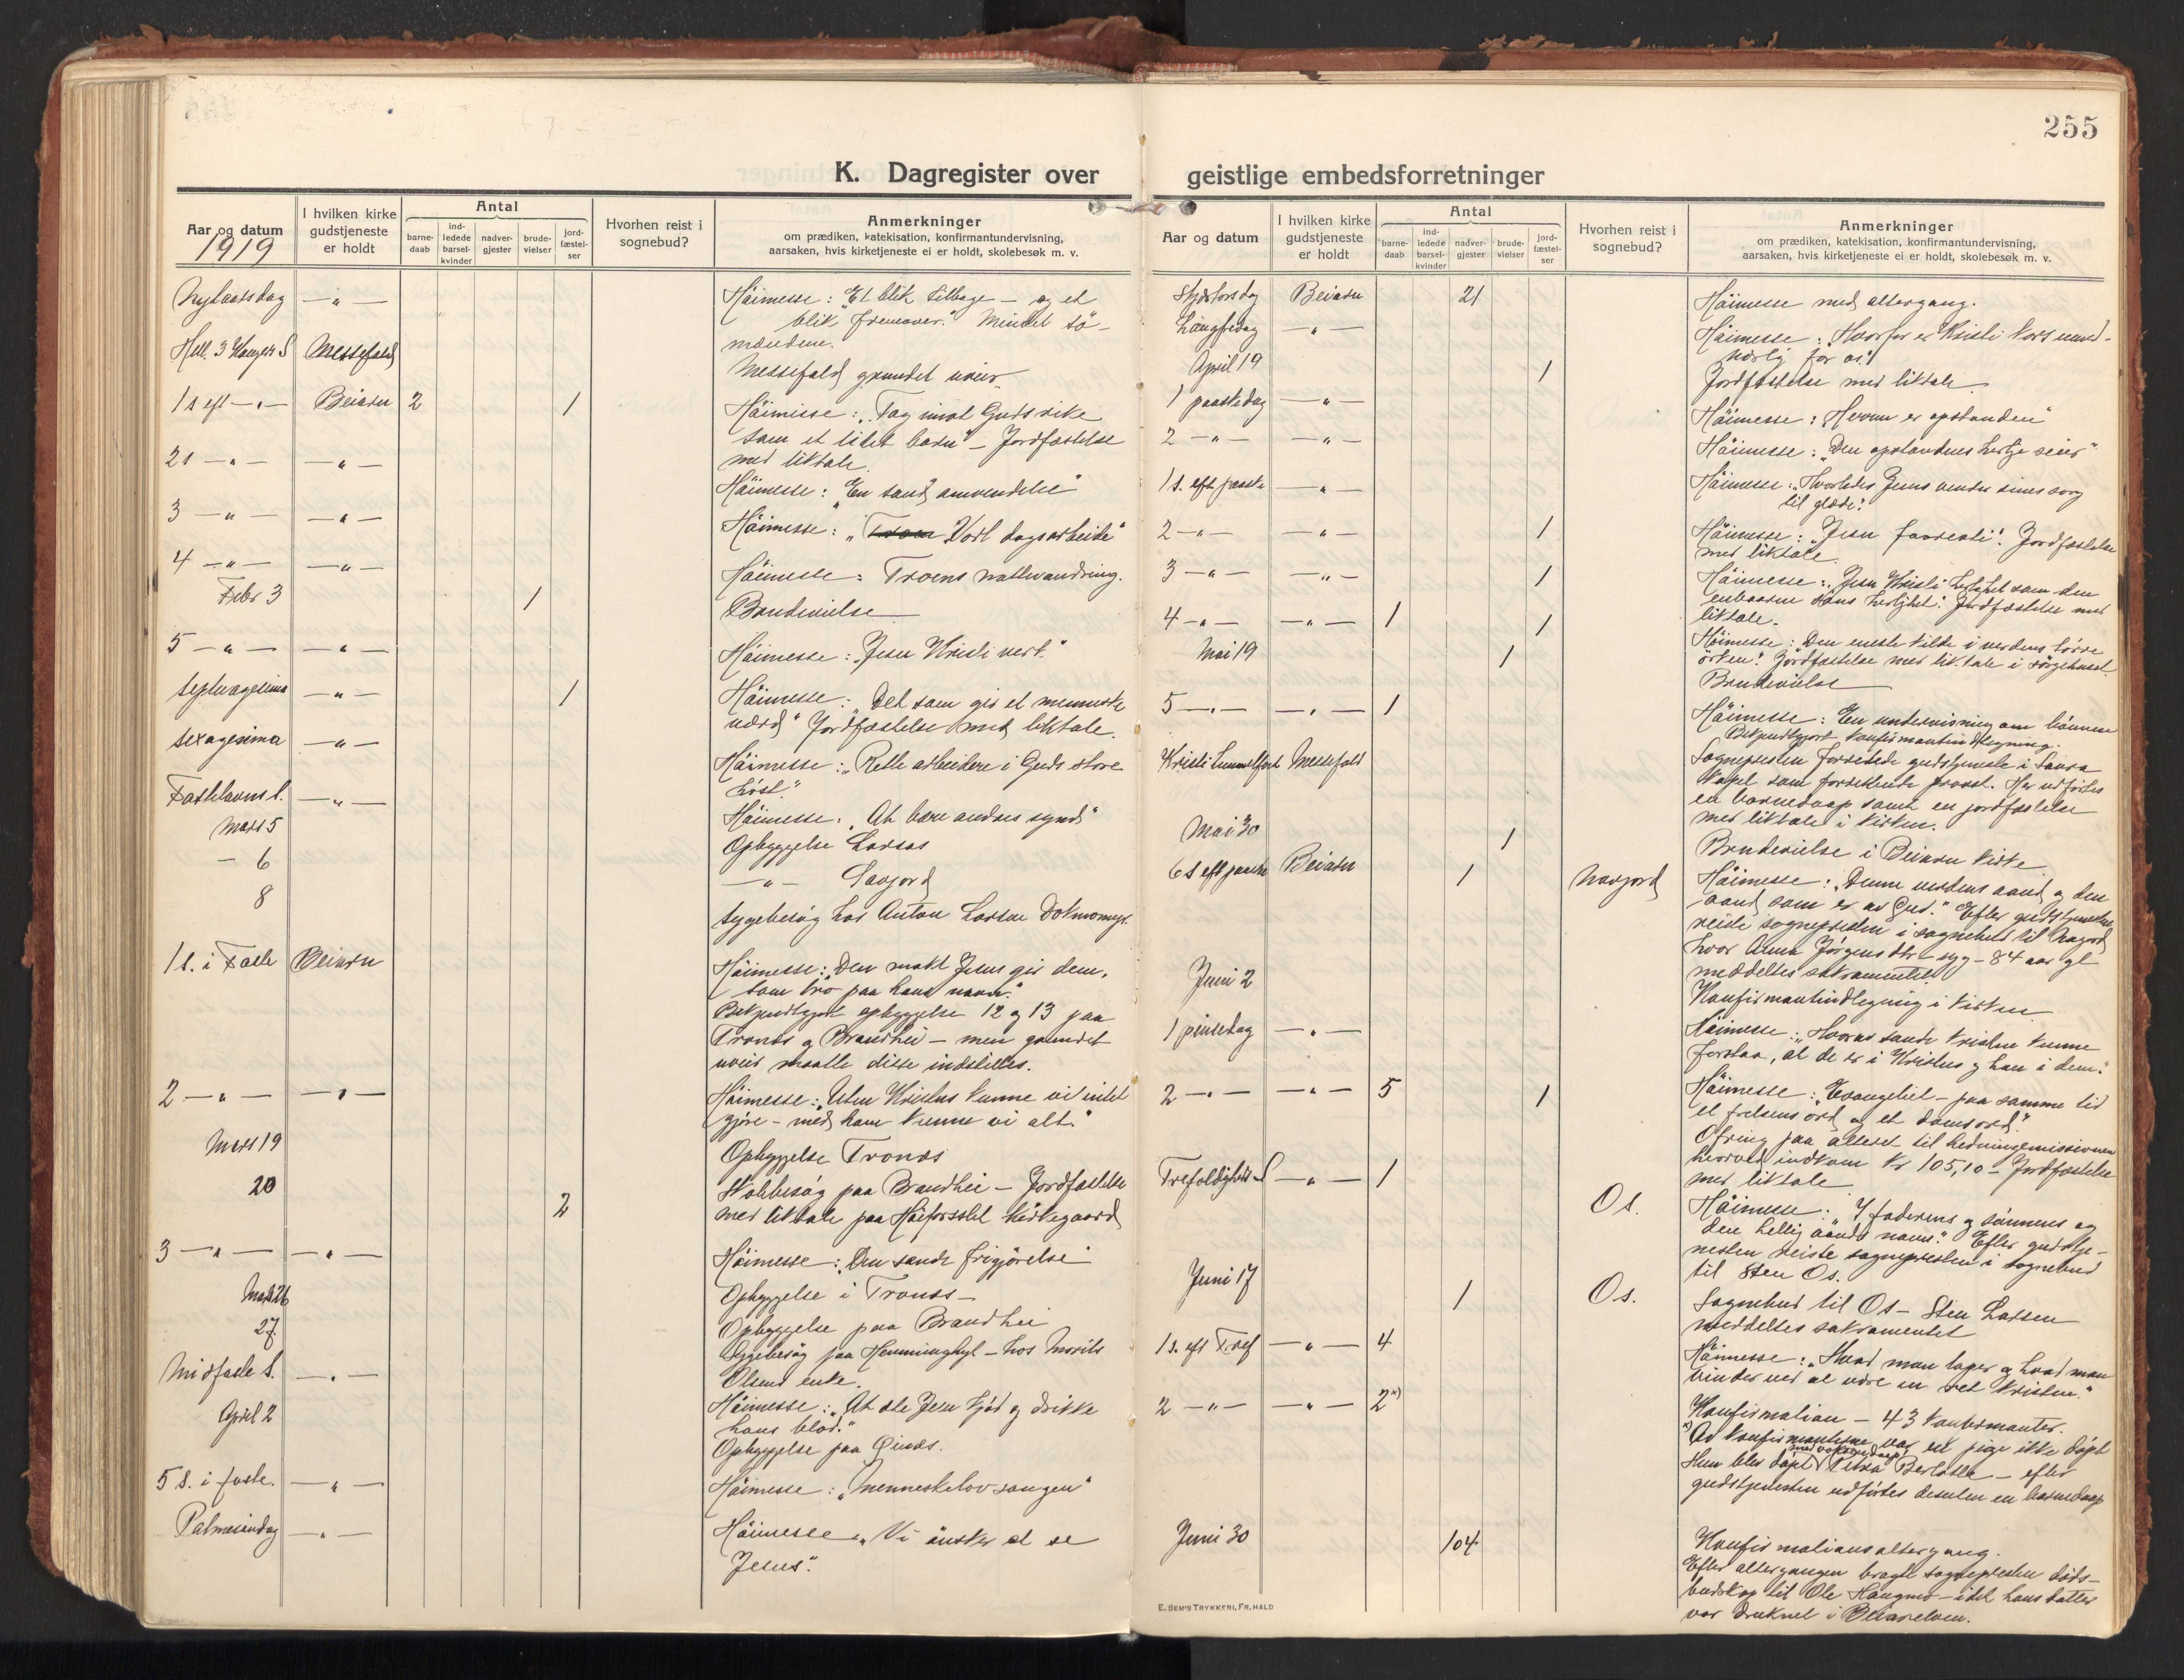 SAT, Ministerialprotokoller, klokkerbøker og fødselsregistre - Nordland, 846/L0650: Ministerialbok nr. 846A08, 1916-1935, s. 255